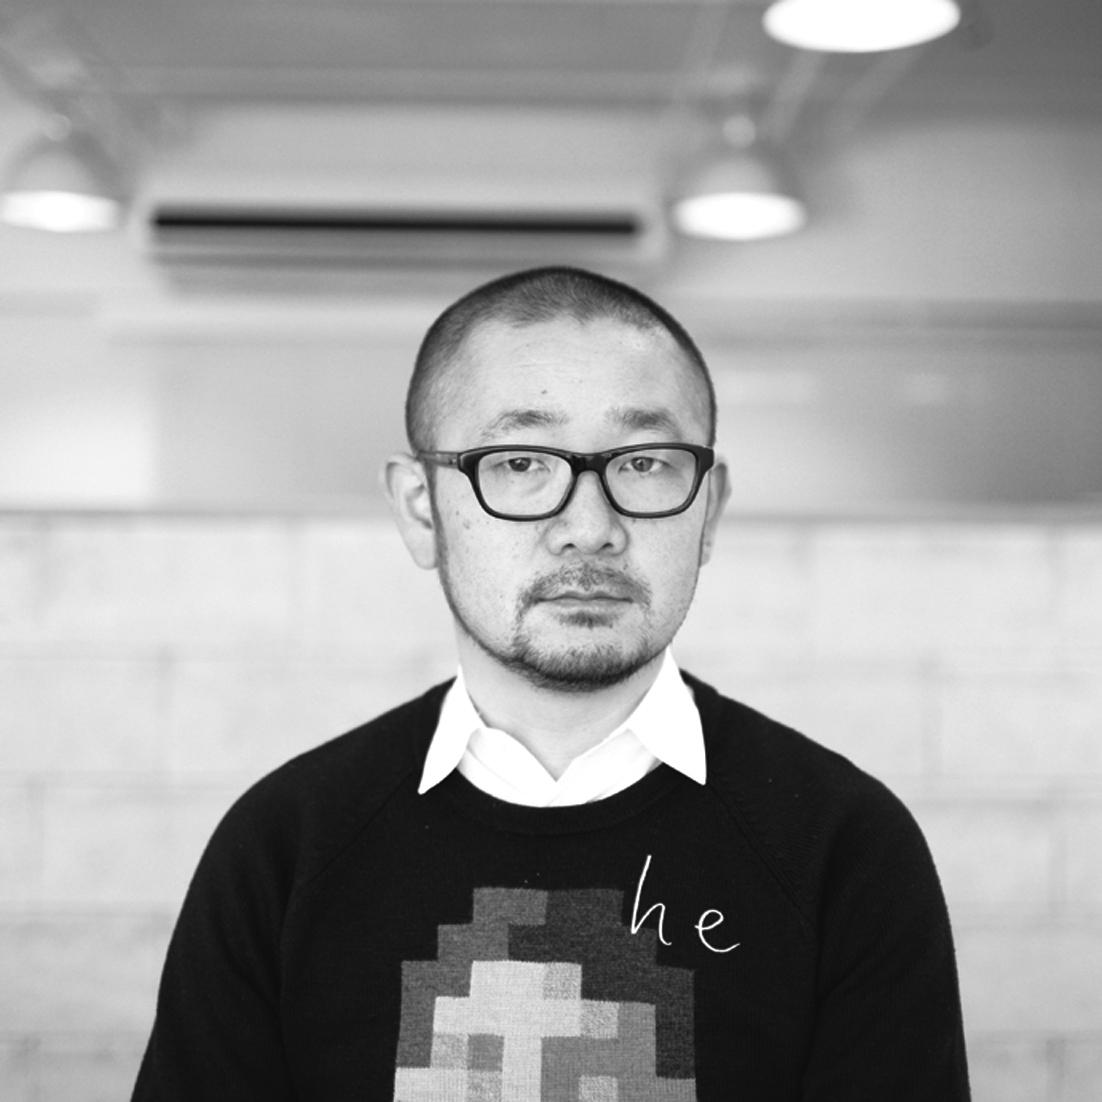 6D_KISHINO+2+copy.jpg